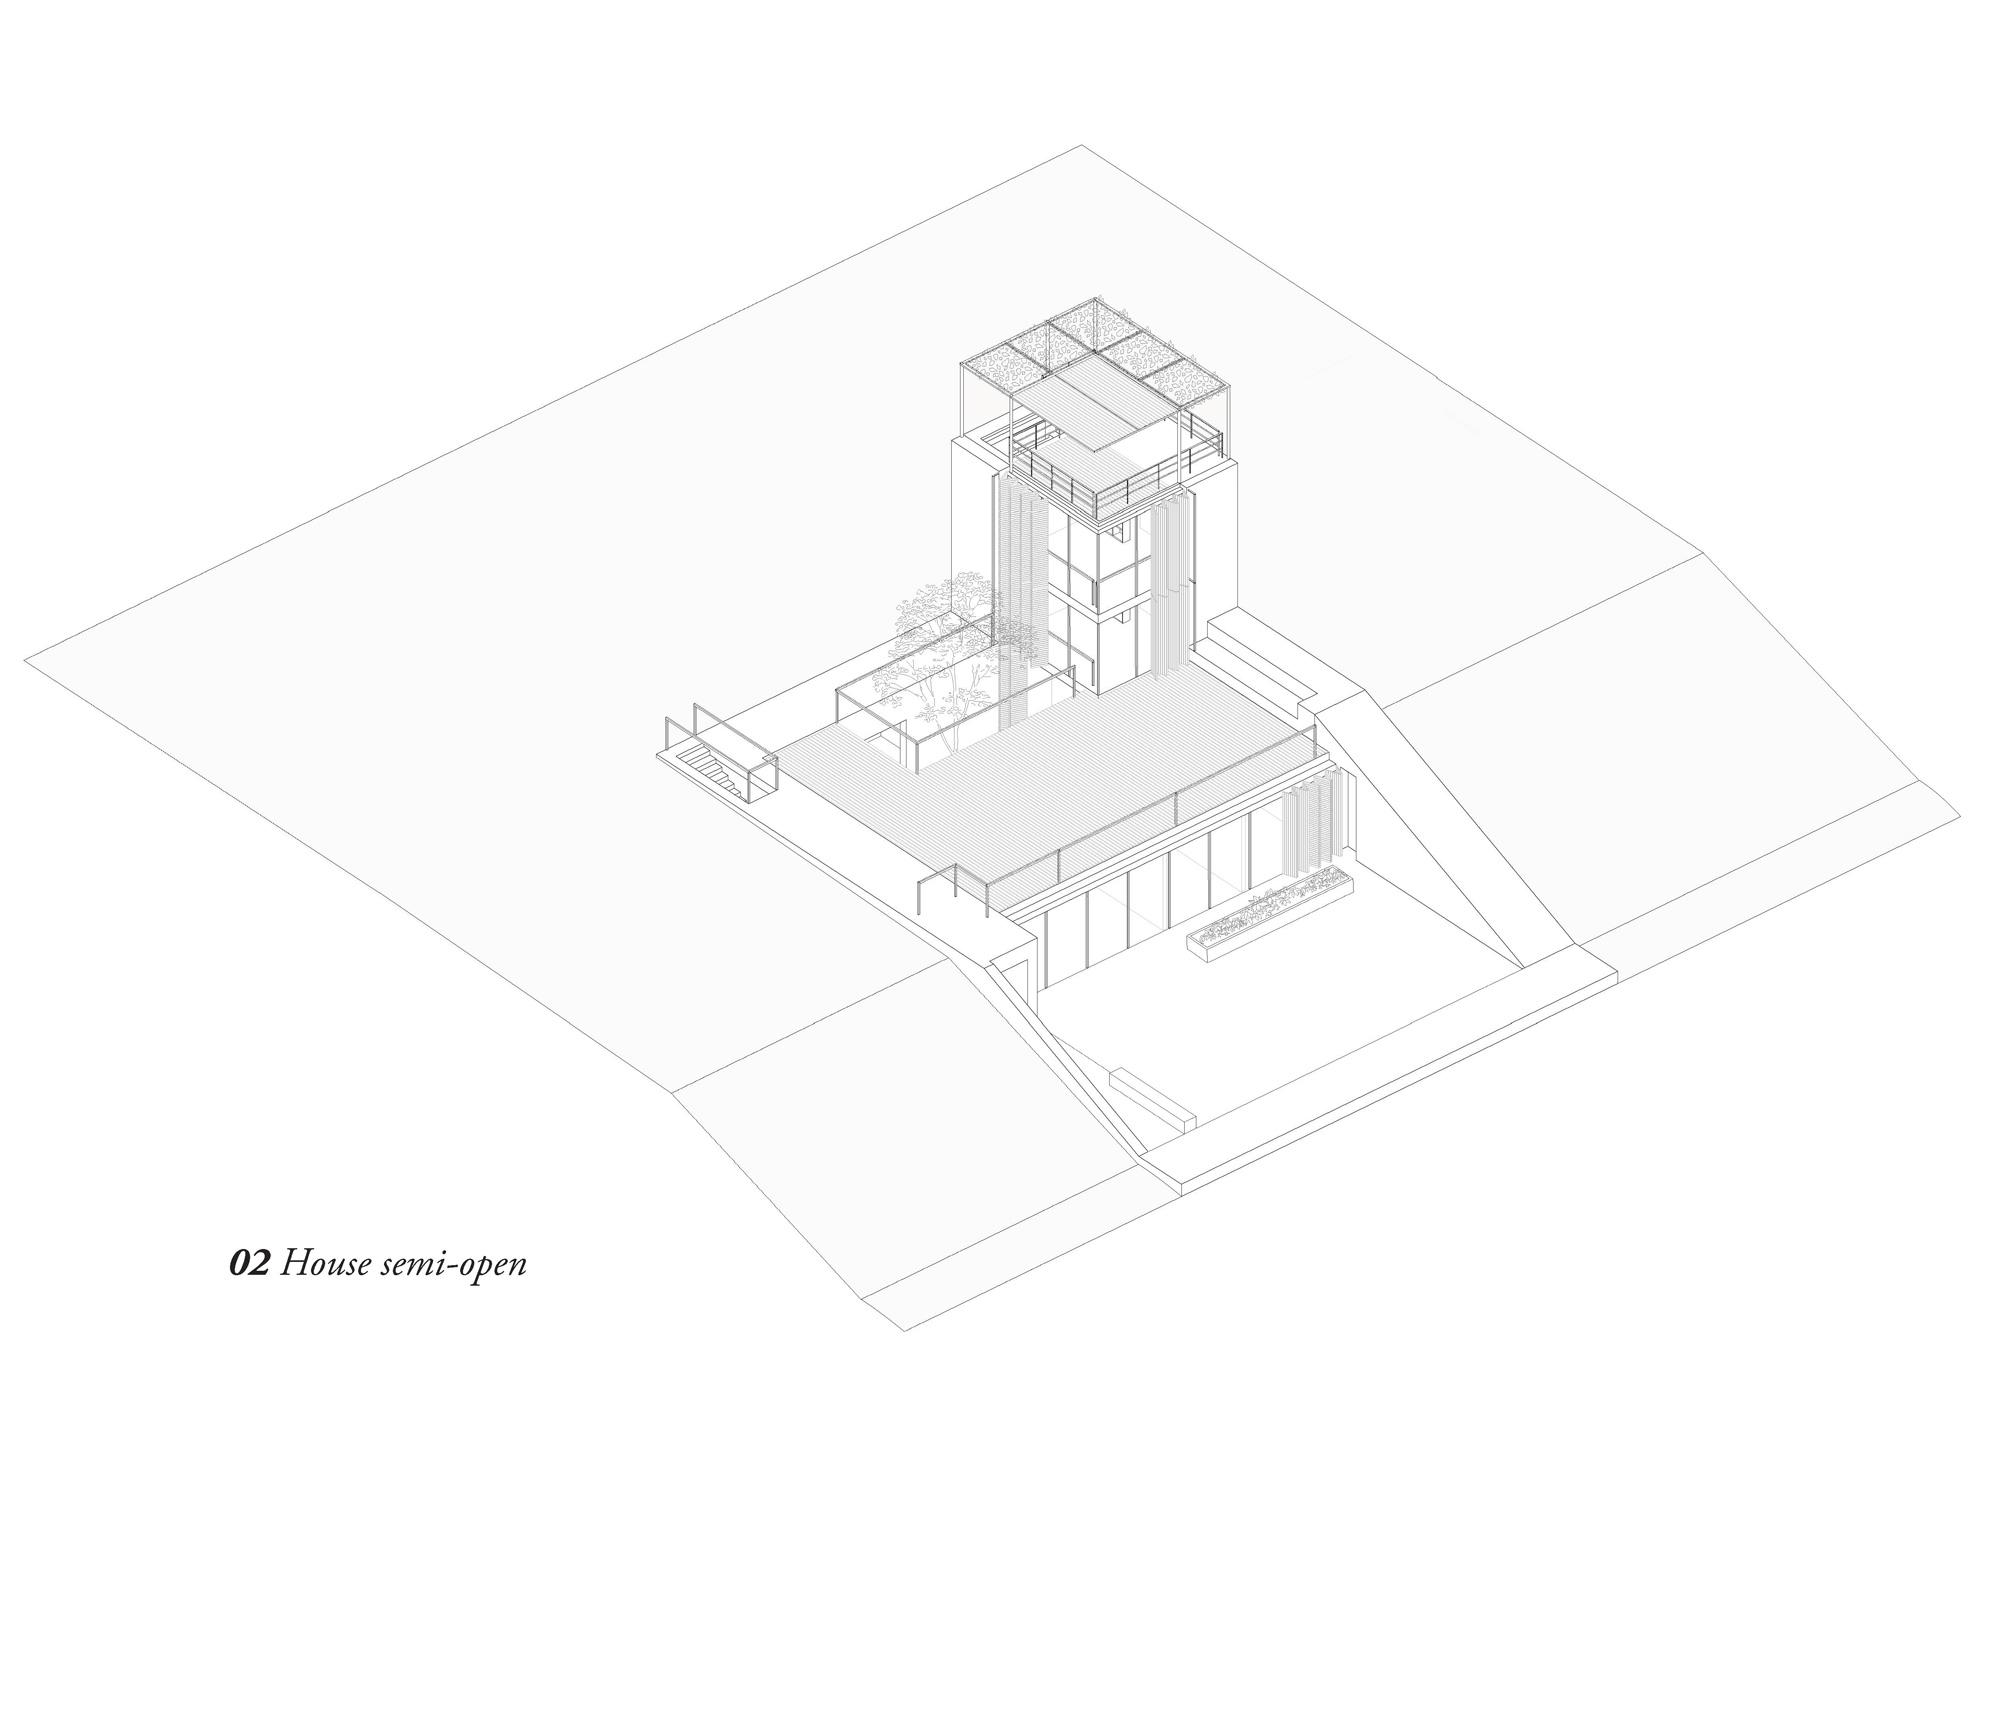 Vista assonometrica casa semi aperta © Hashim Sarkis Studios